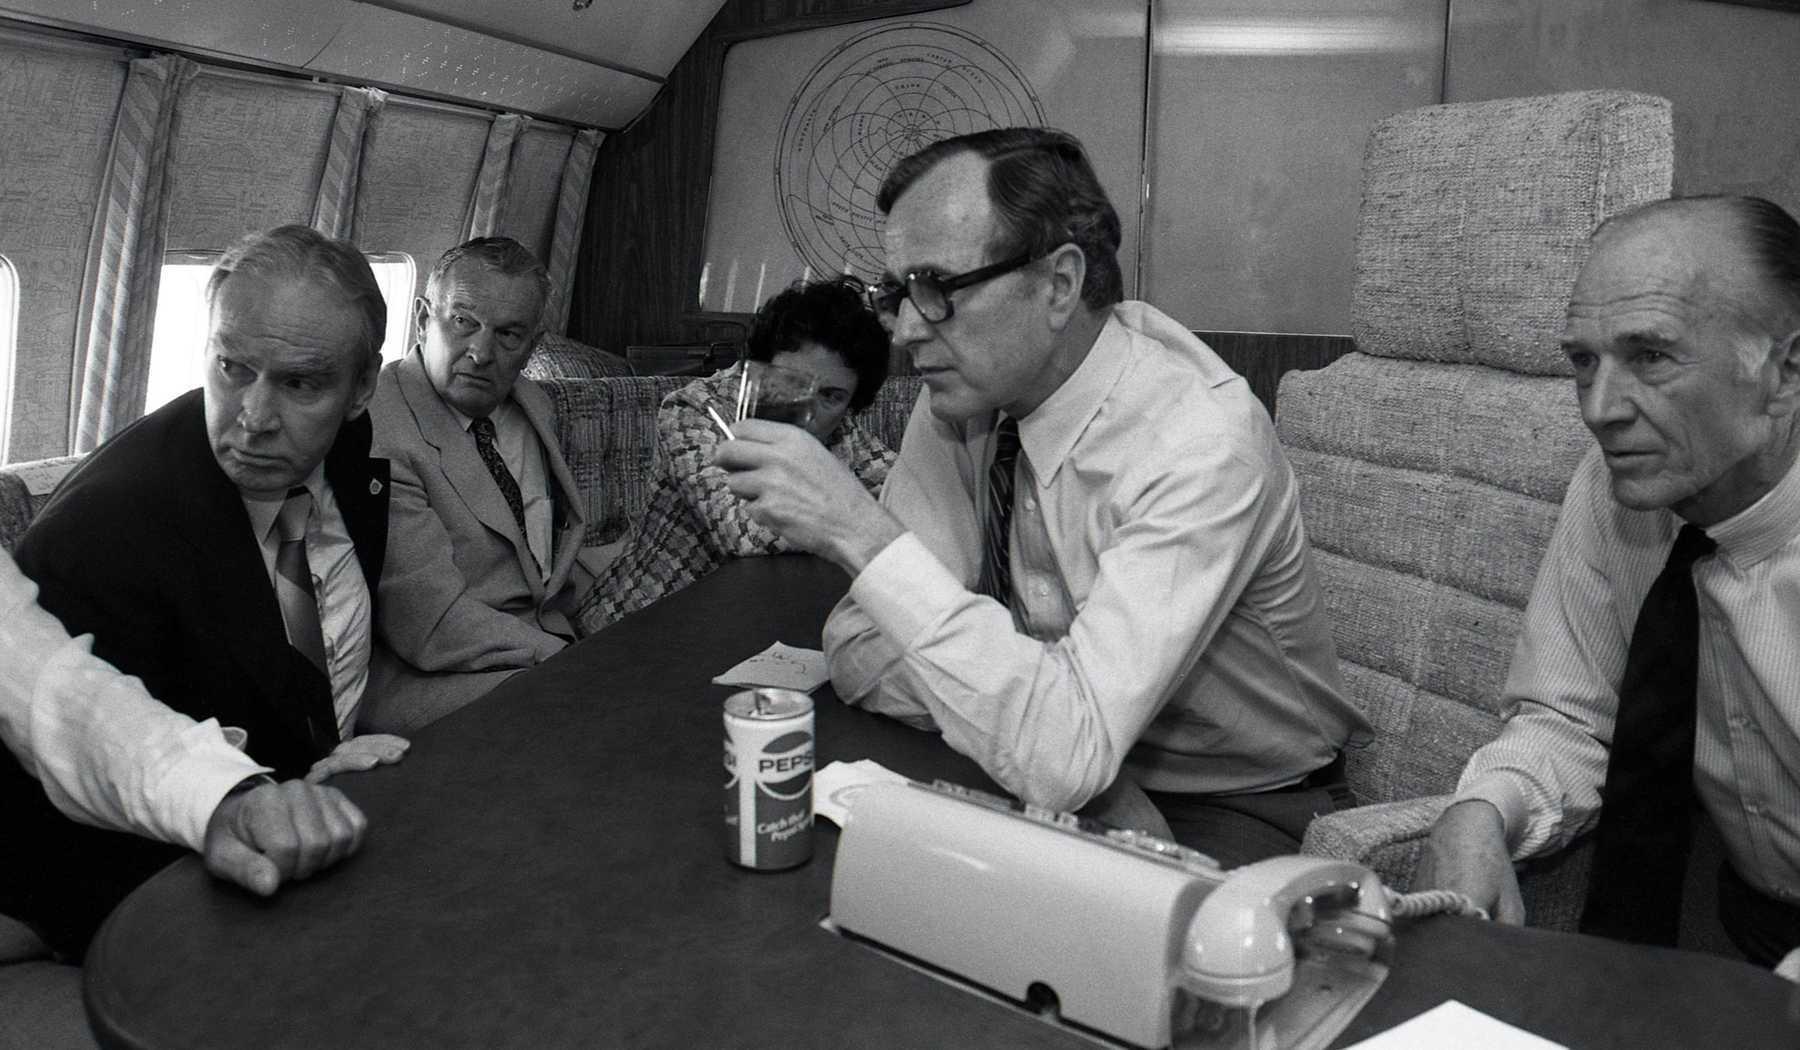 Leroy Johnson Threatening The President For The Gulf War